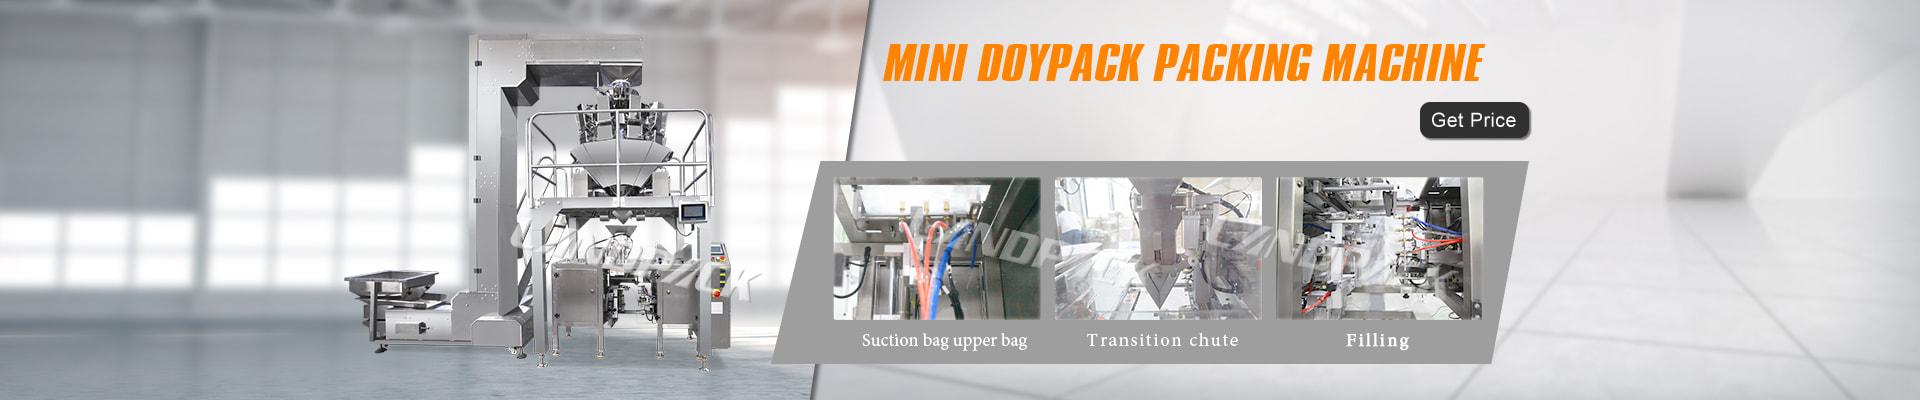 Mini Doypack Packing Machine